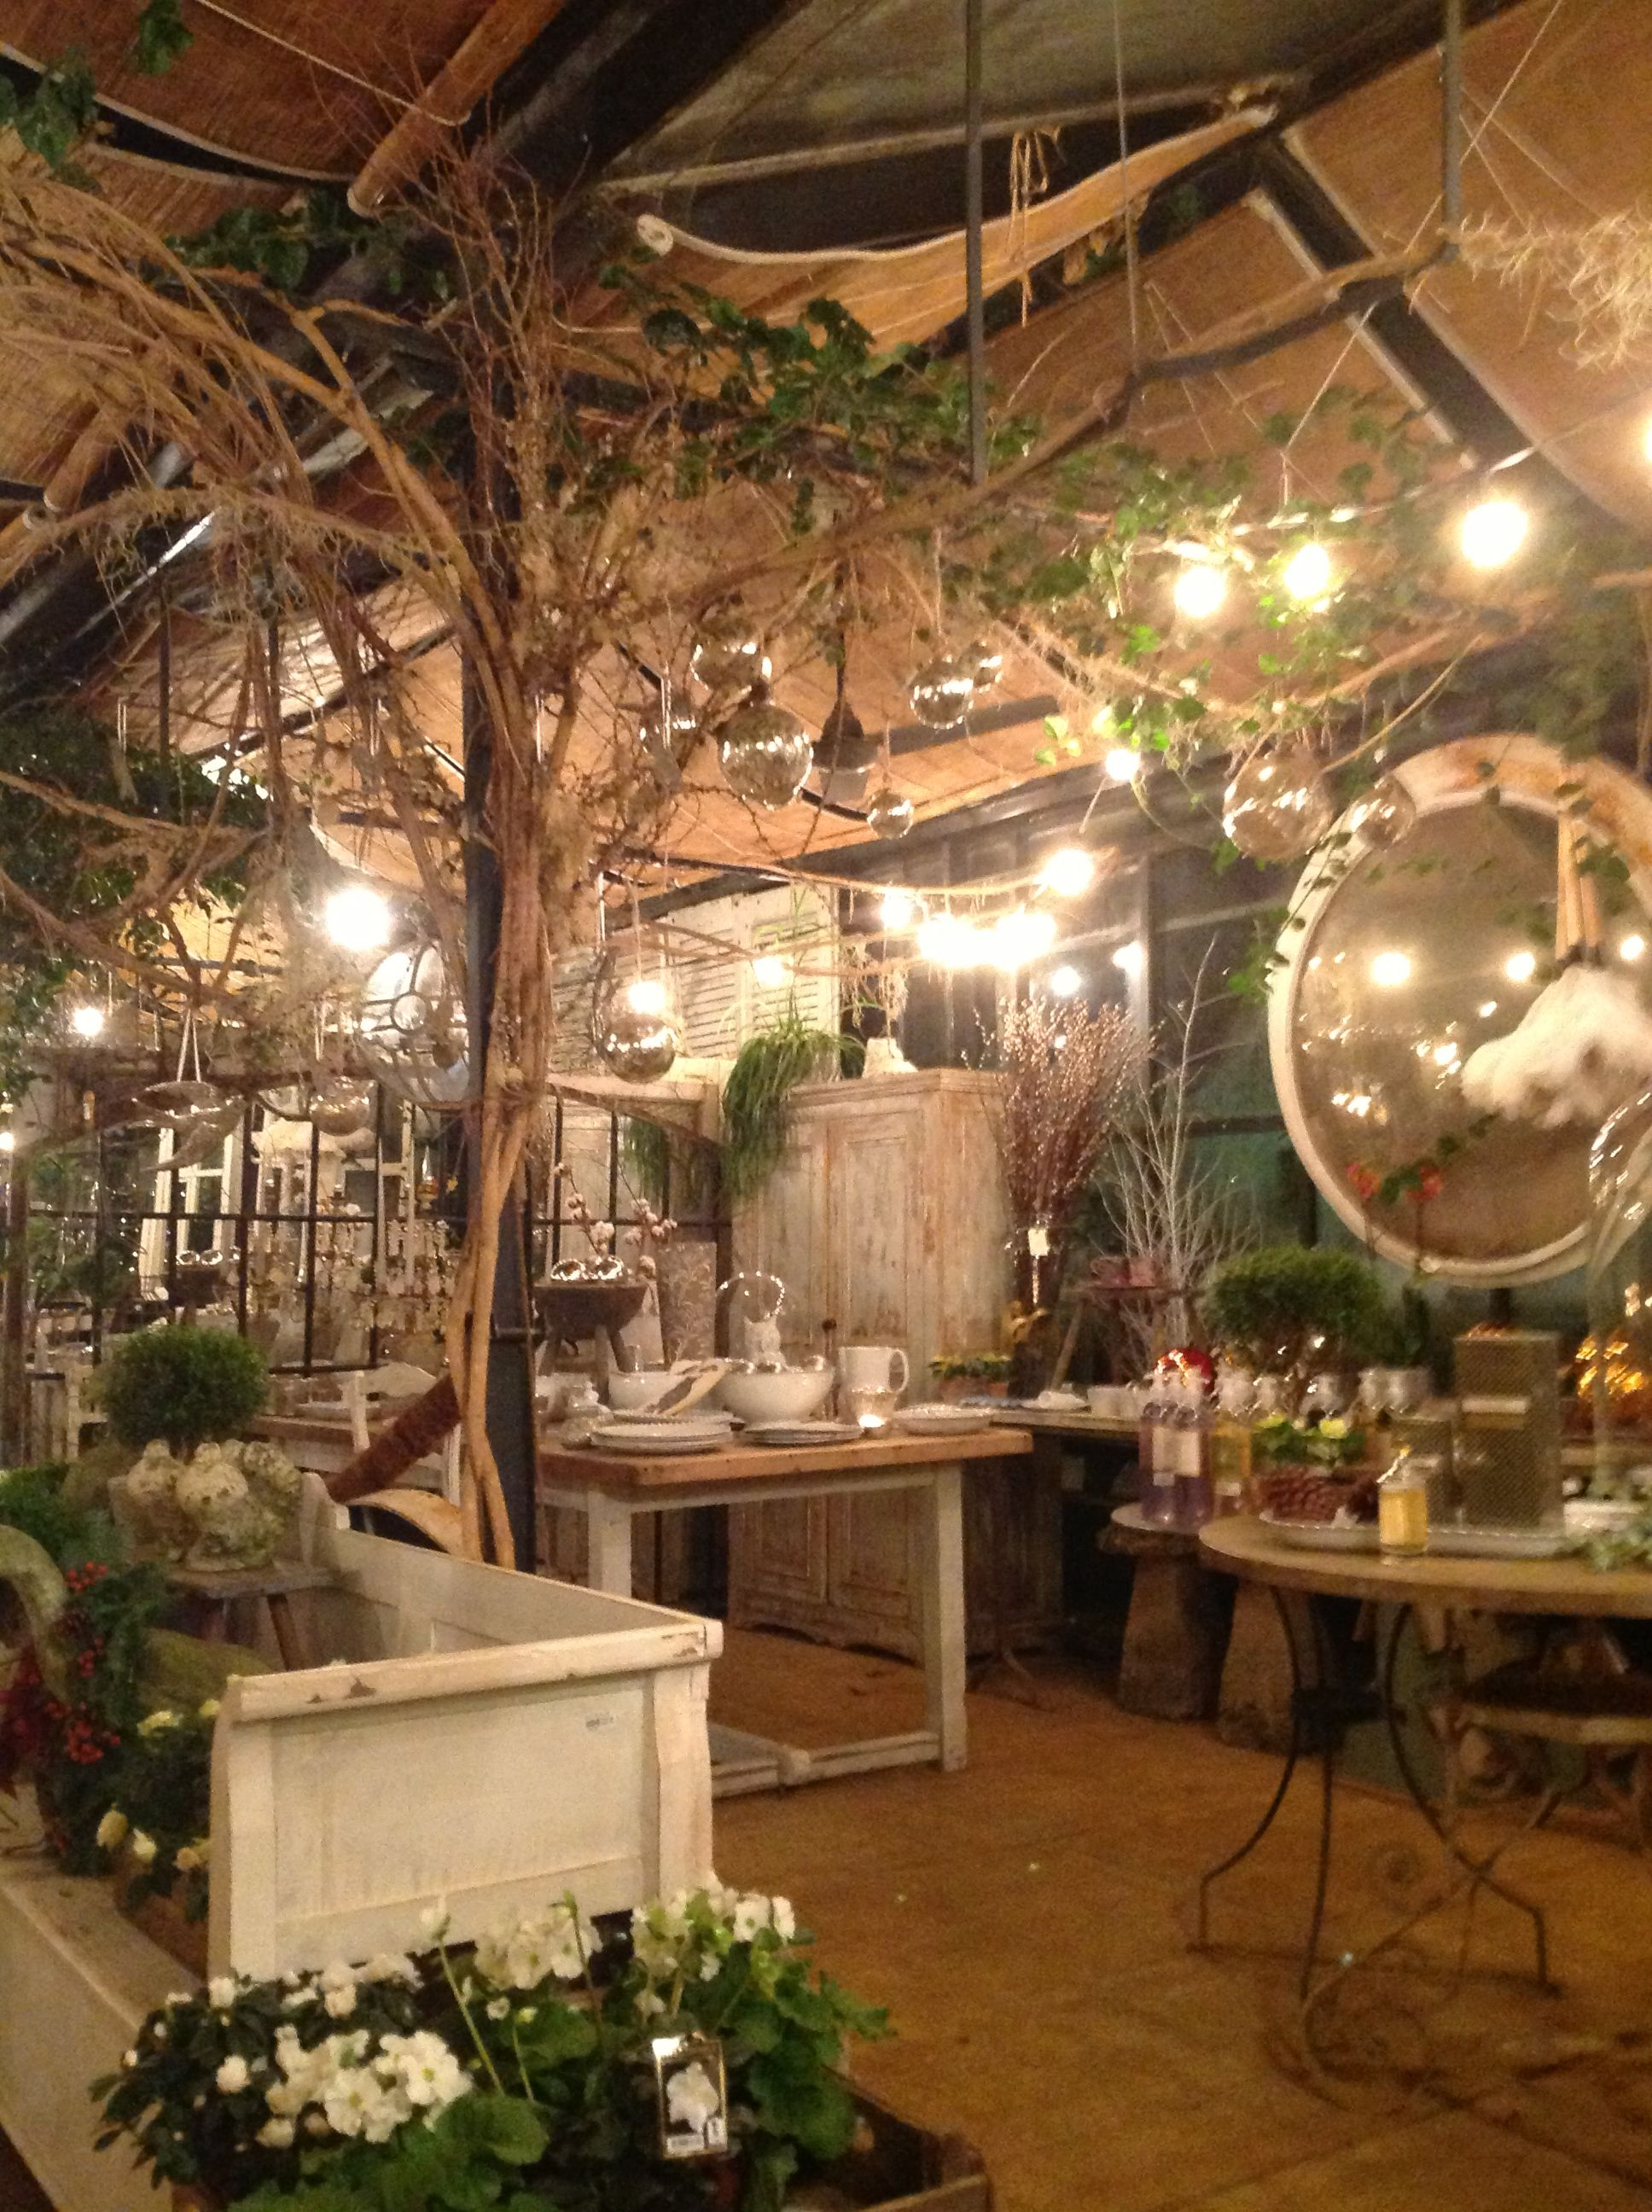 Petersham Nurseries store fronts, retail displays, ideas